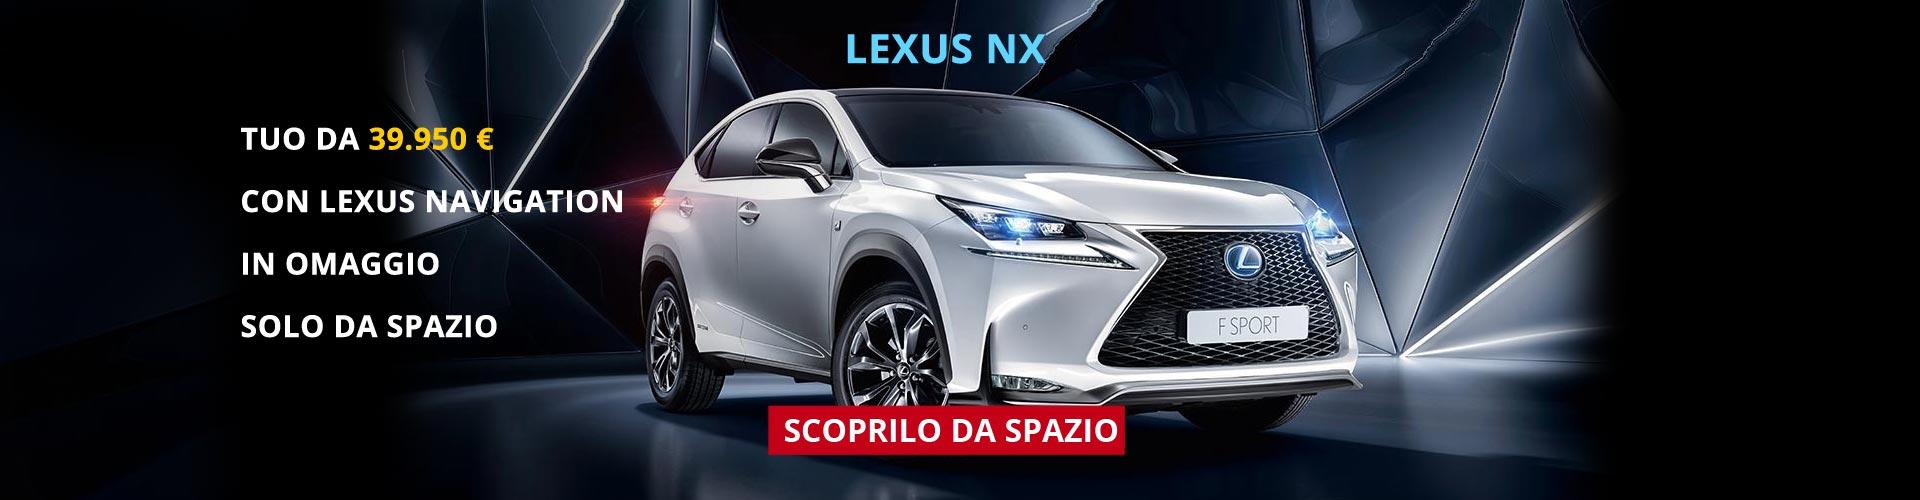 Lexus NX da Spazio Torino